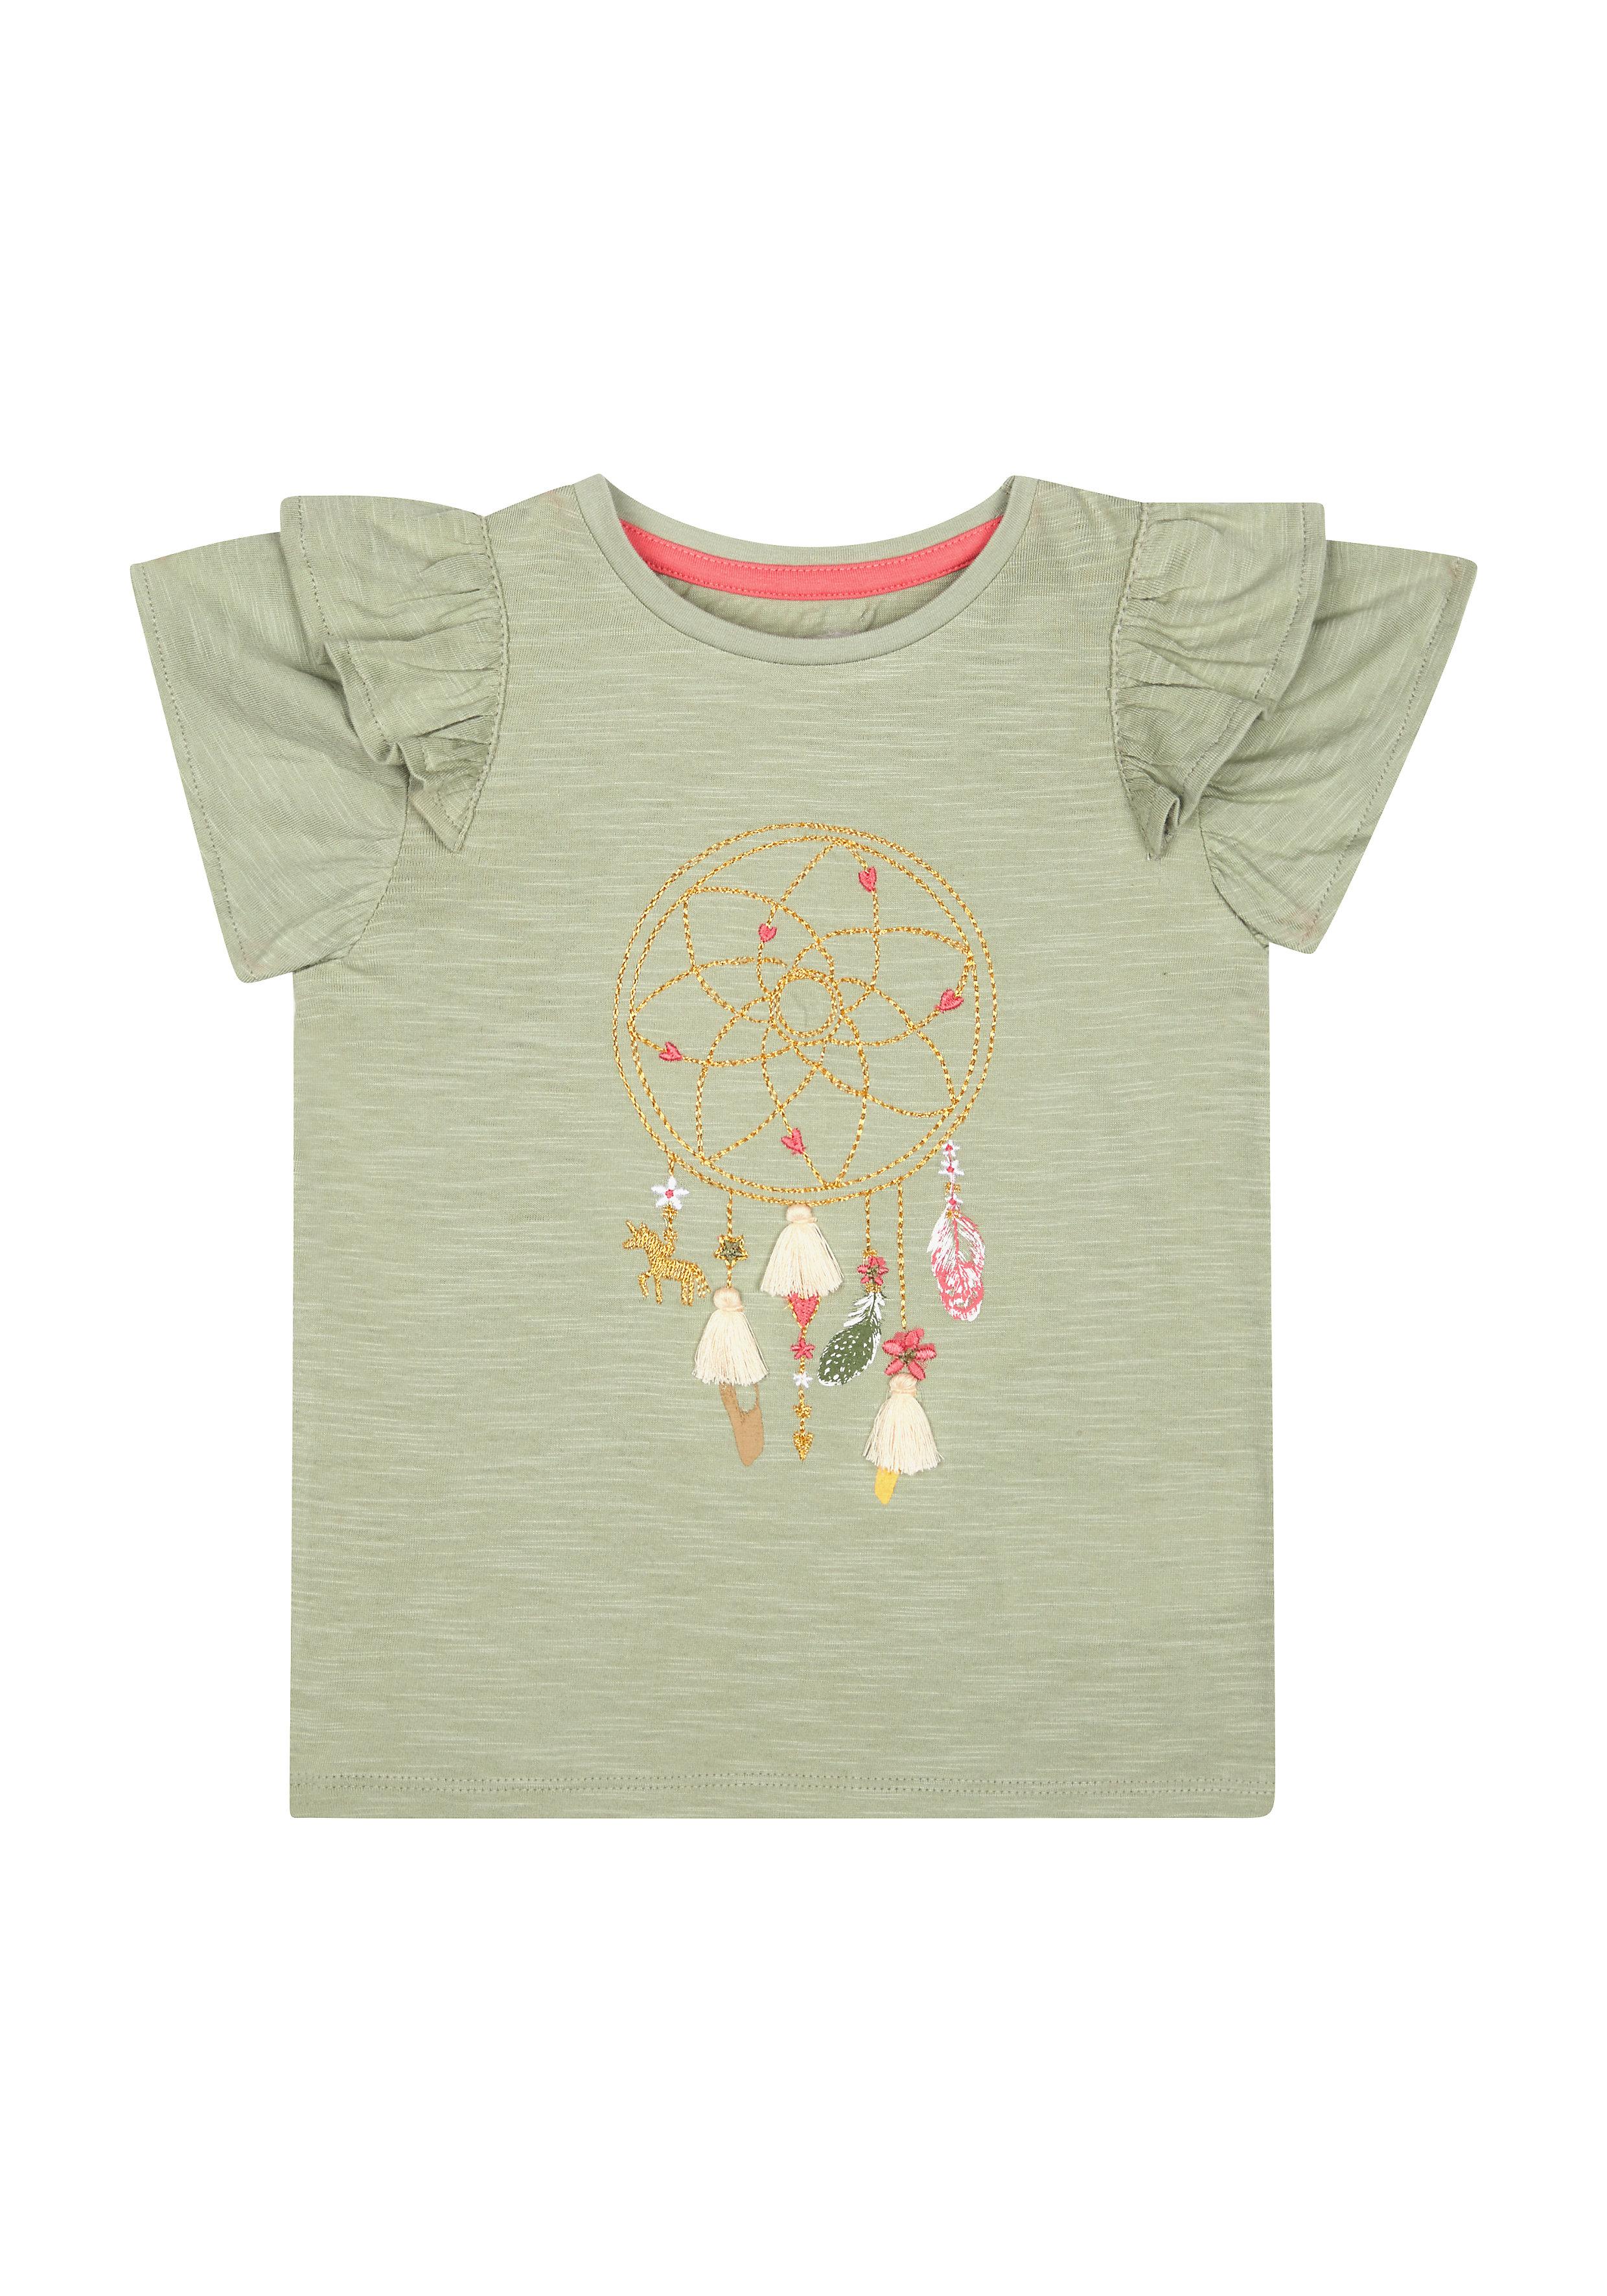 Mothercare | Girls Half Sleeves Round Neck T-shirts  - Khaki